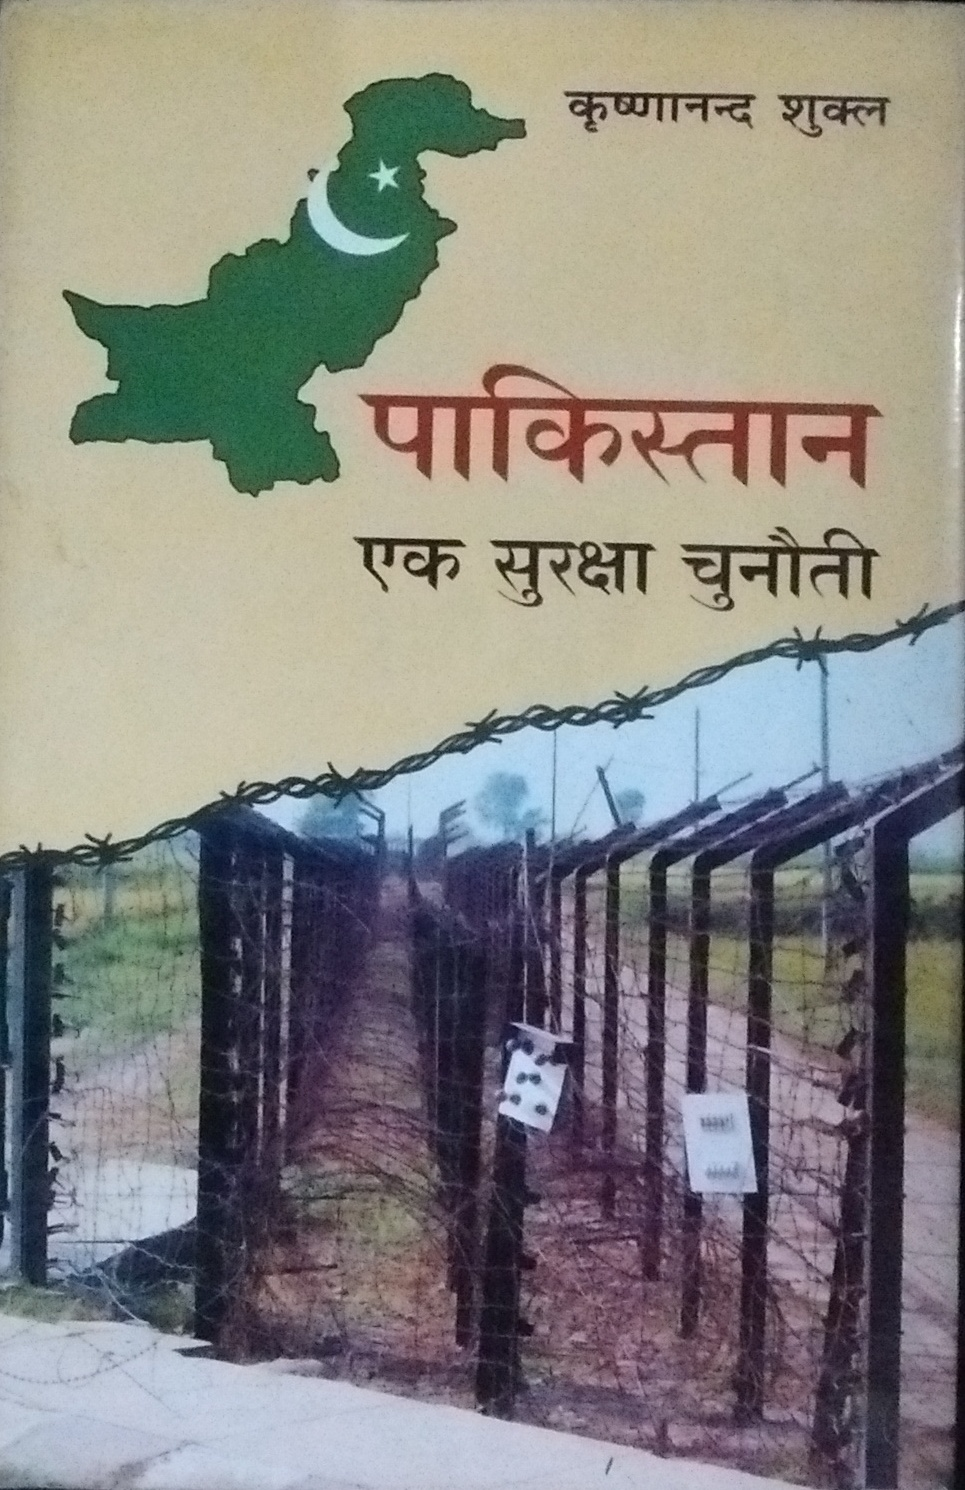 terrorist in india in hindi